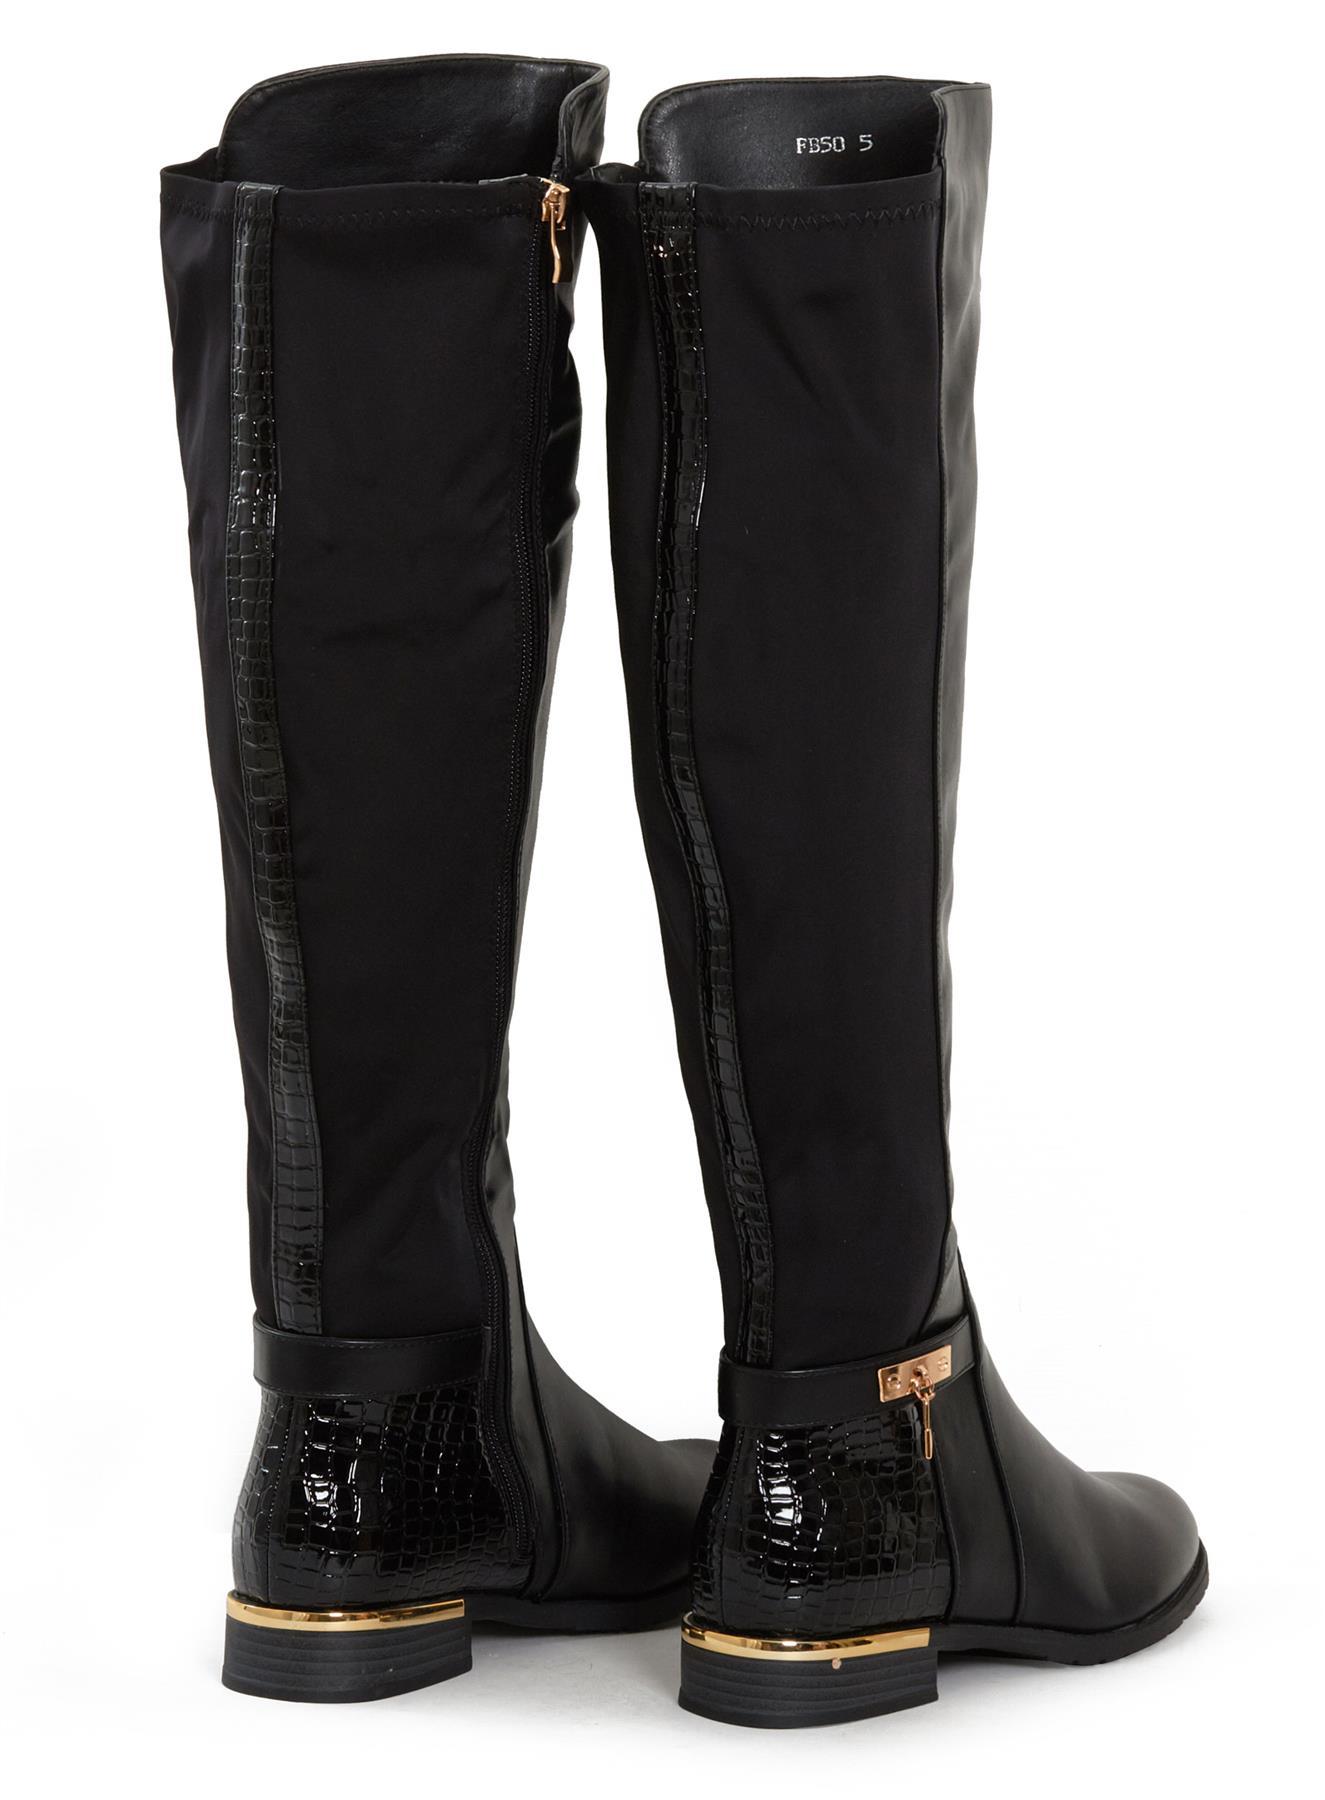 Womens-Ladies-Knee-High-Gold-Detail-Low-Block-Heel-Zip-Up-PU-Suede-Black-Boots thumbnail 6